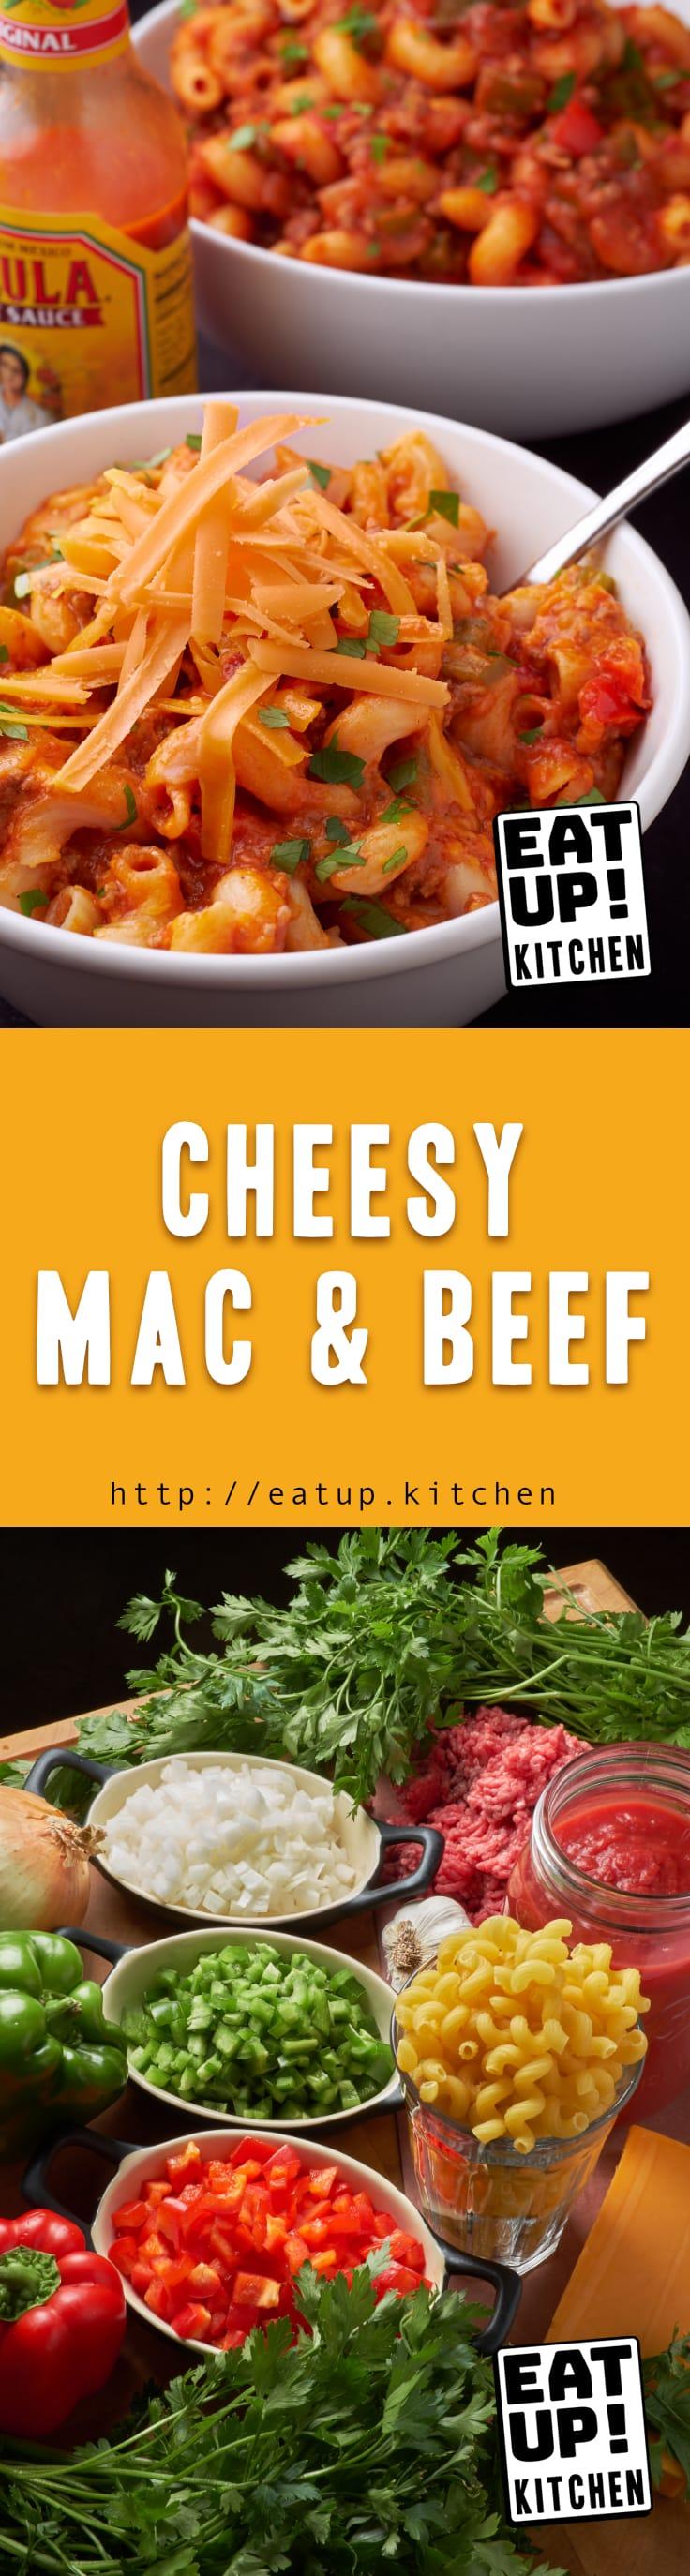 Cheesy Mac and Beef